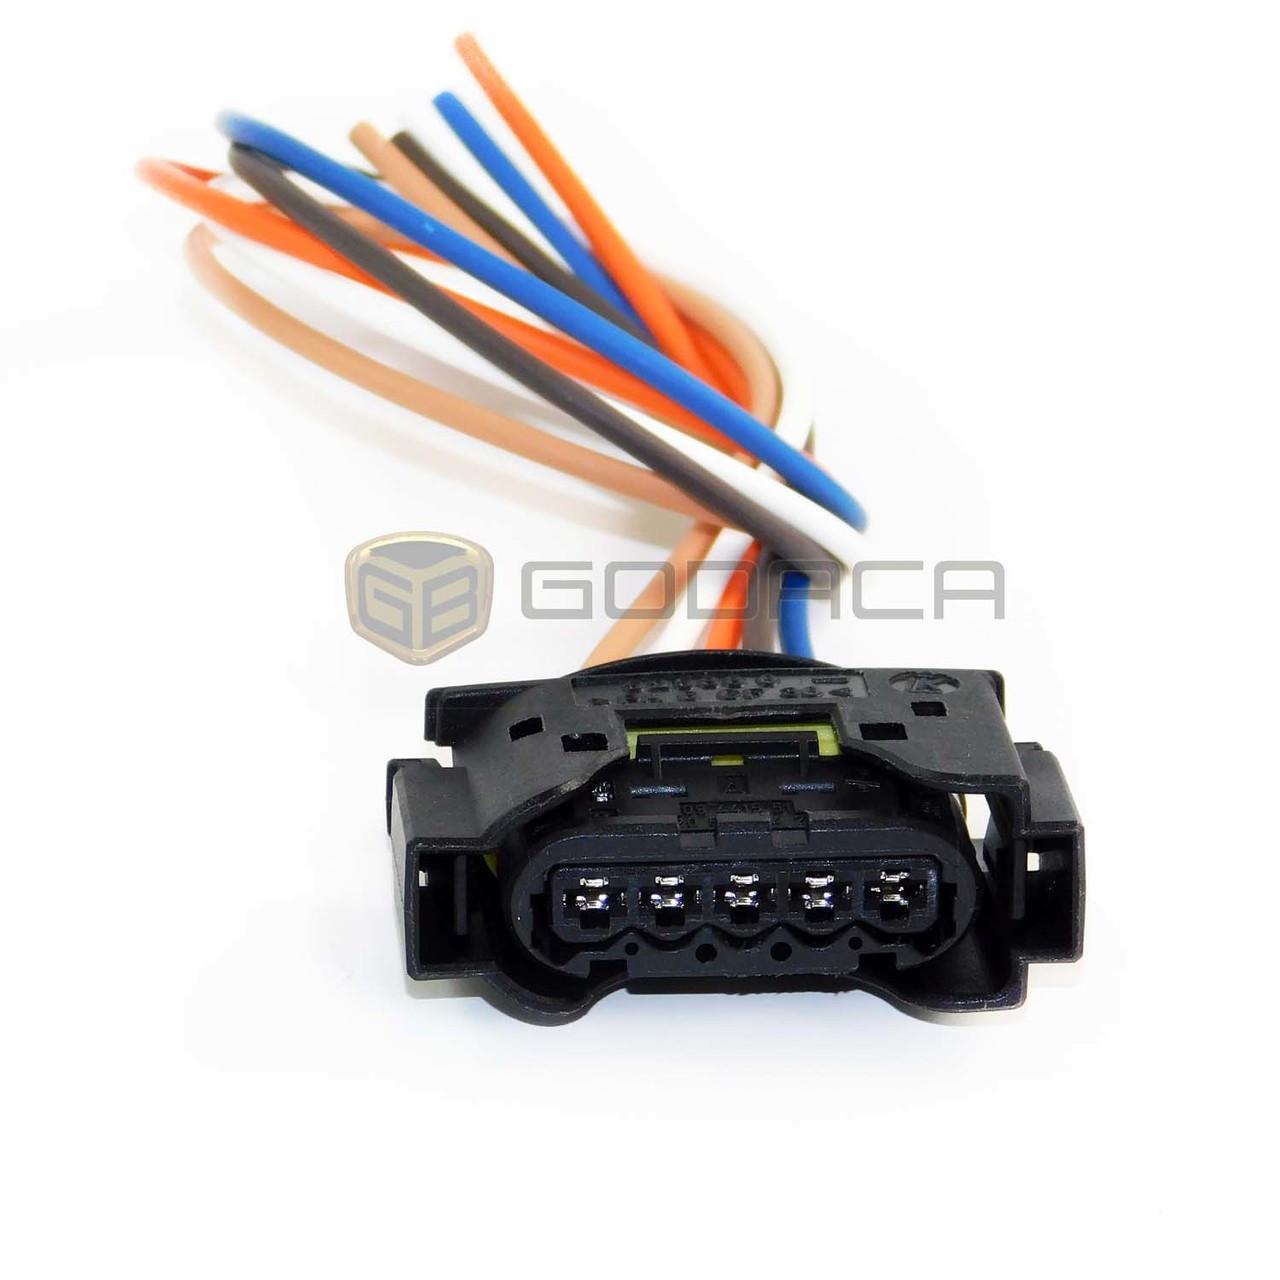 hight resolution of 1x connector 5 way 5 pin for mercedes benz preheater a 2205450429 godaca llc